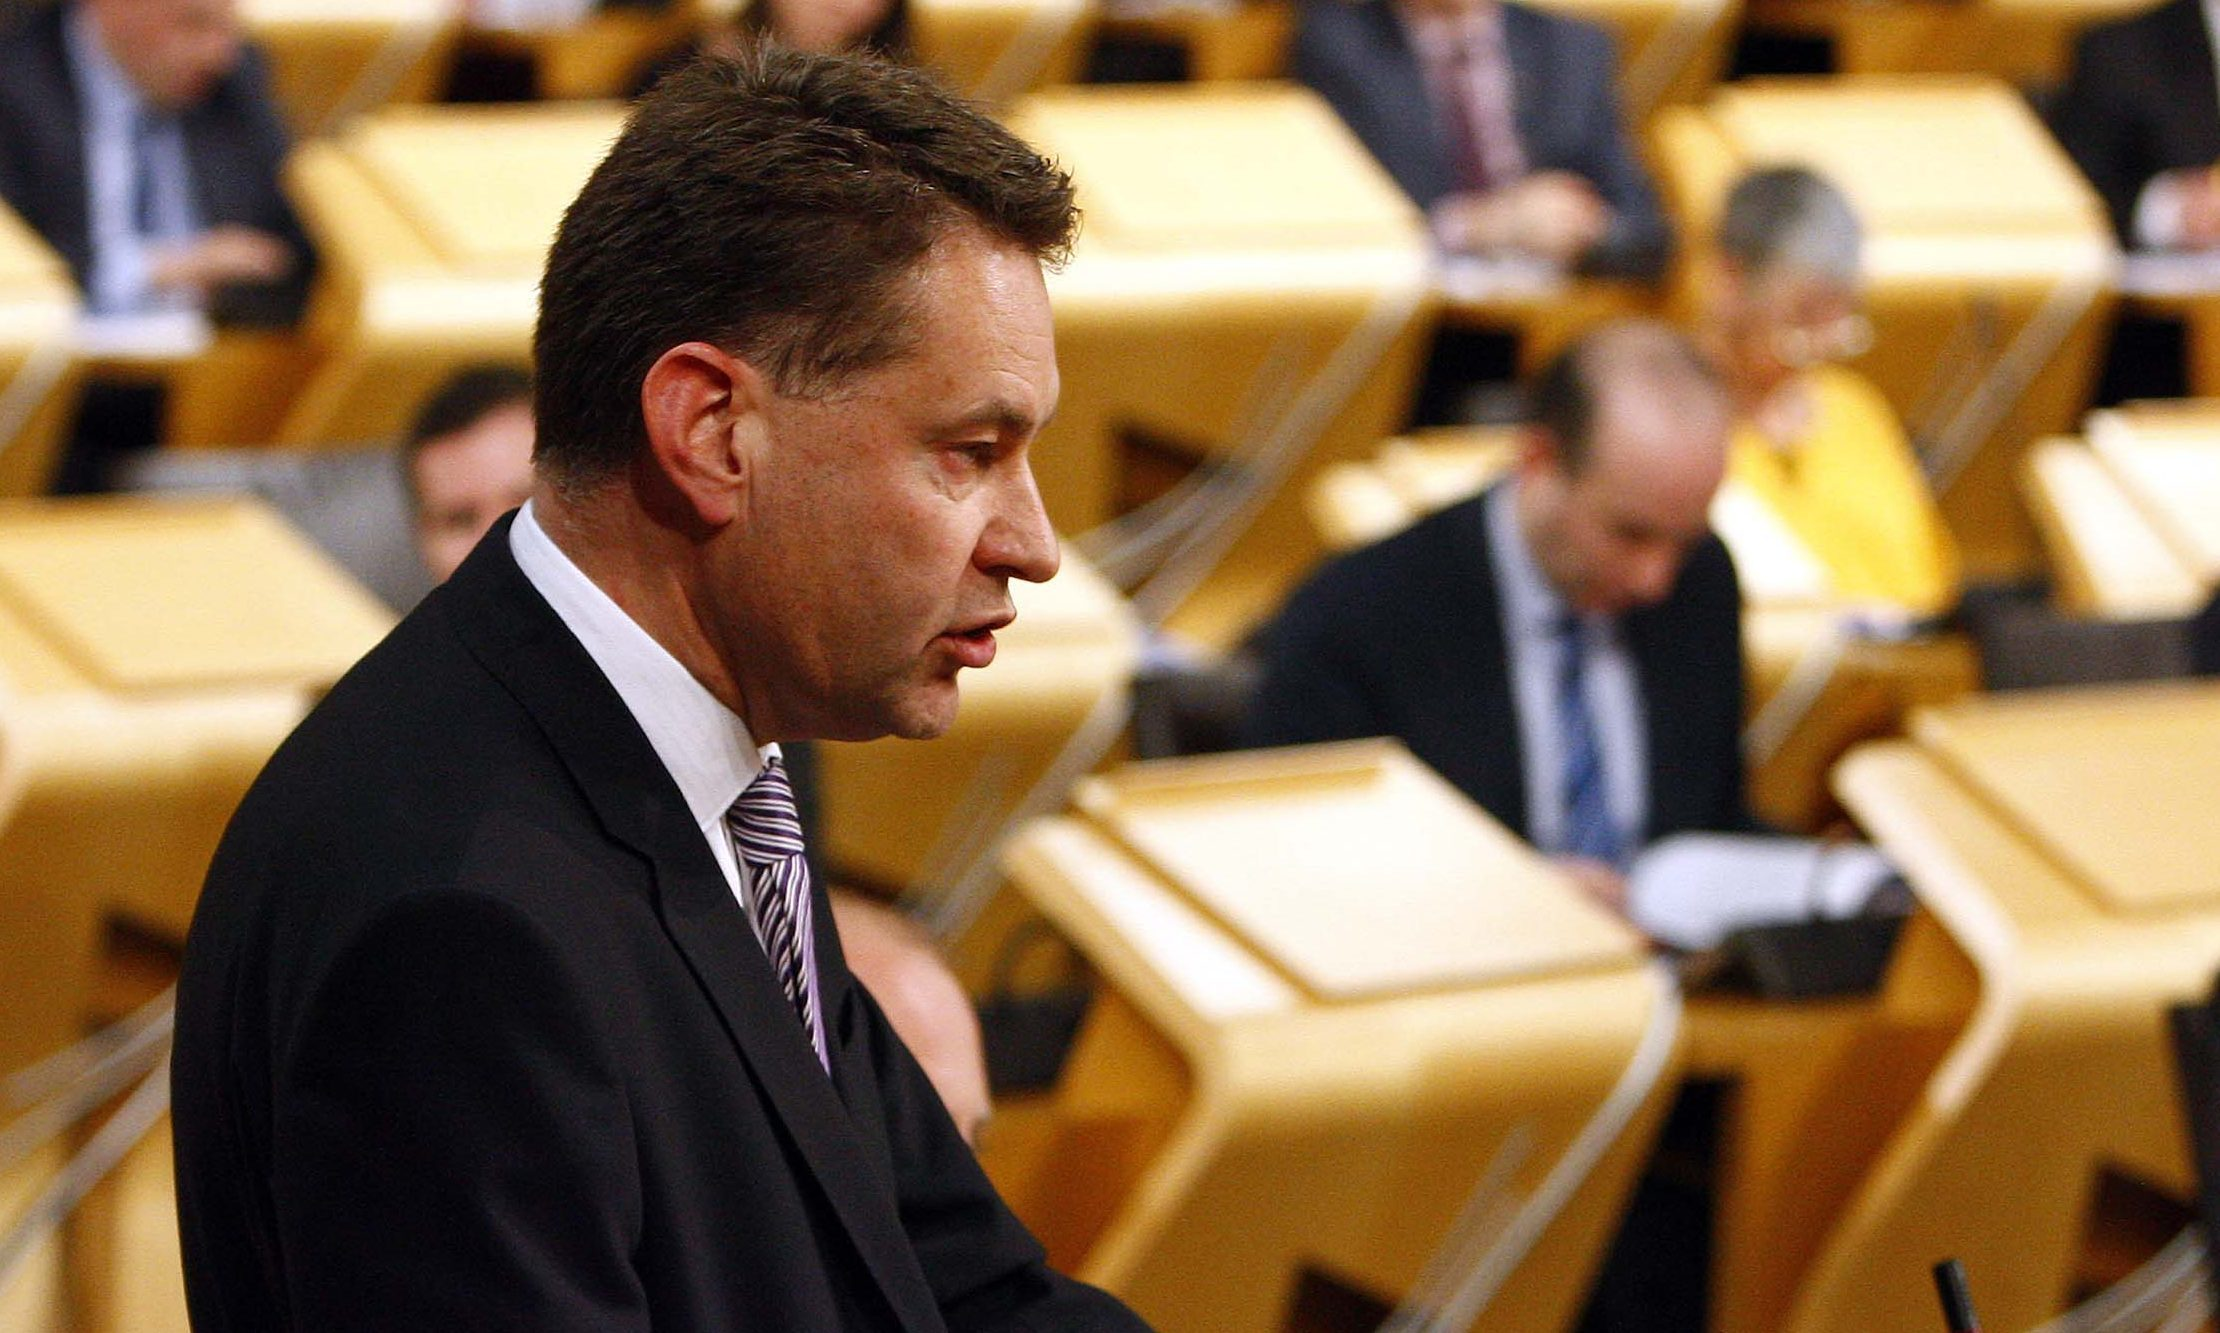 Murdo Fraser addresses the Scottish Parliament